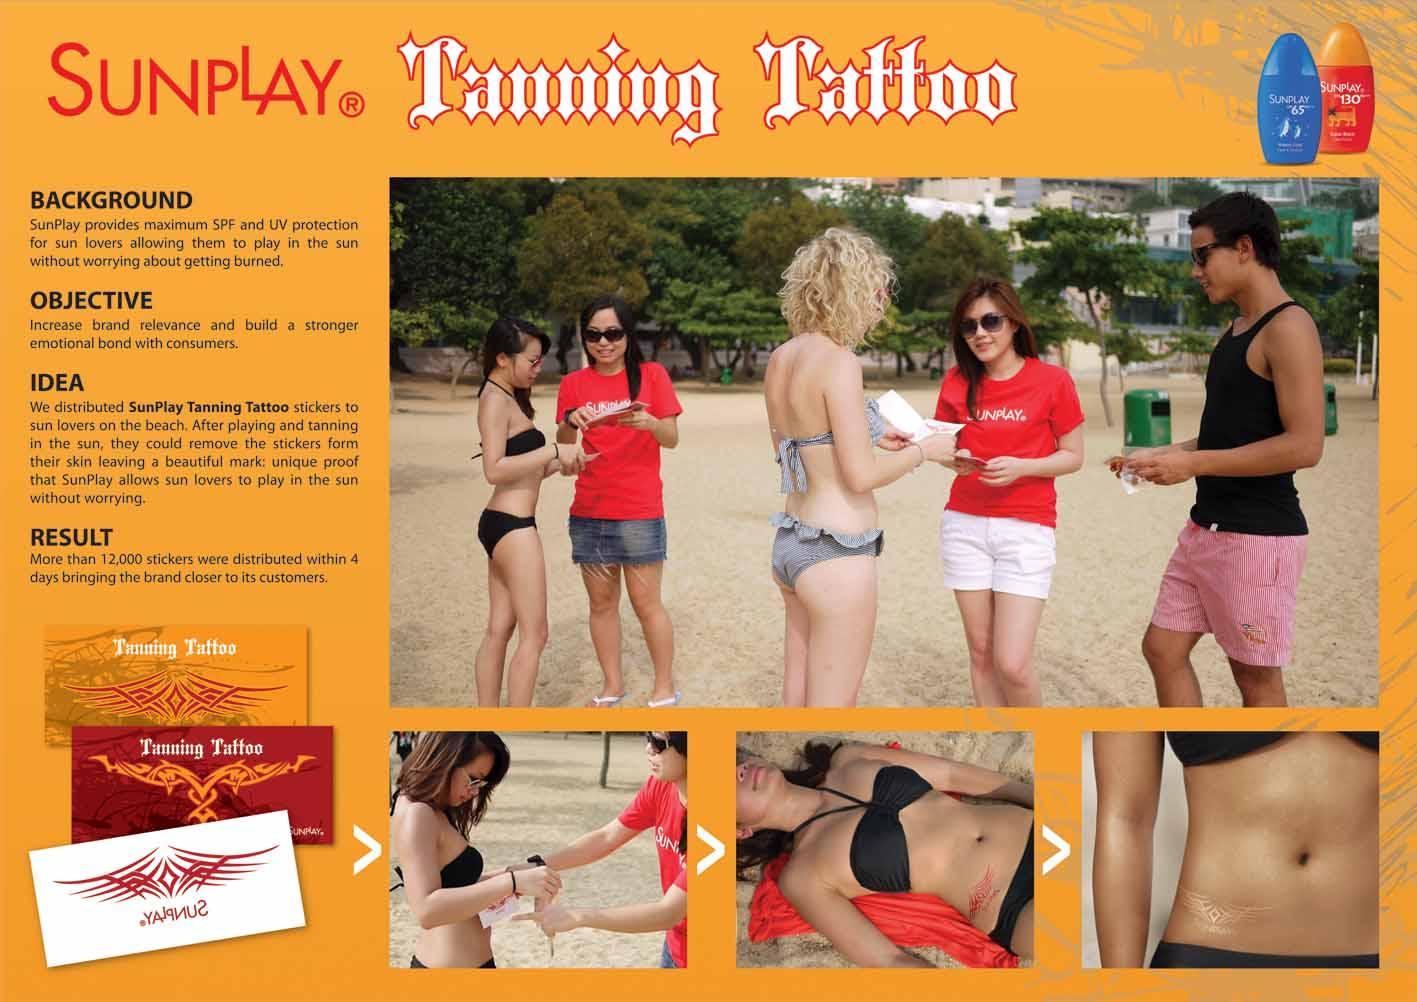 Sunplay Direct Ad -  Tanning Tattoo